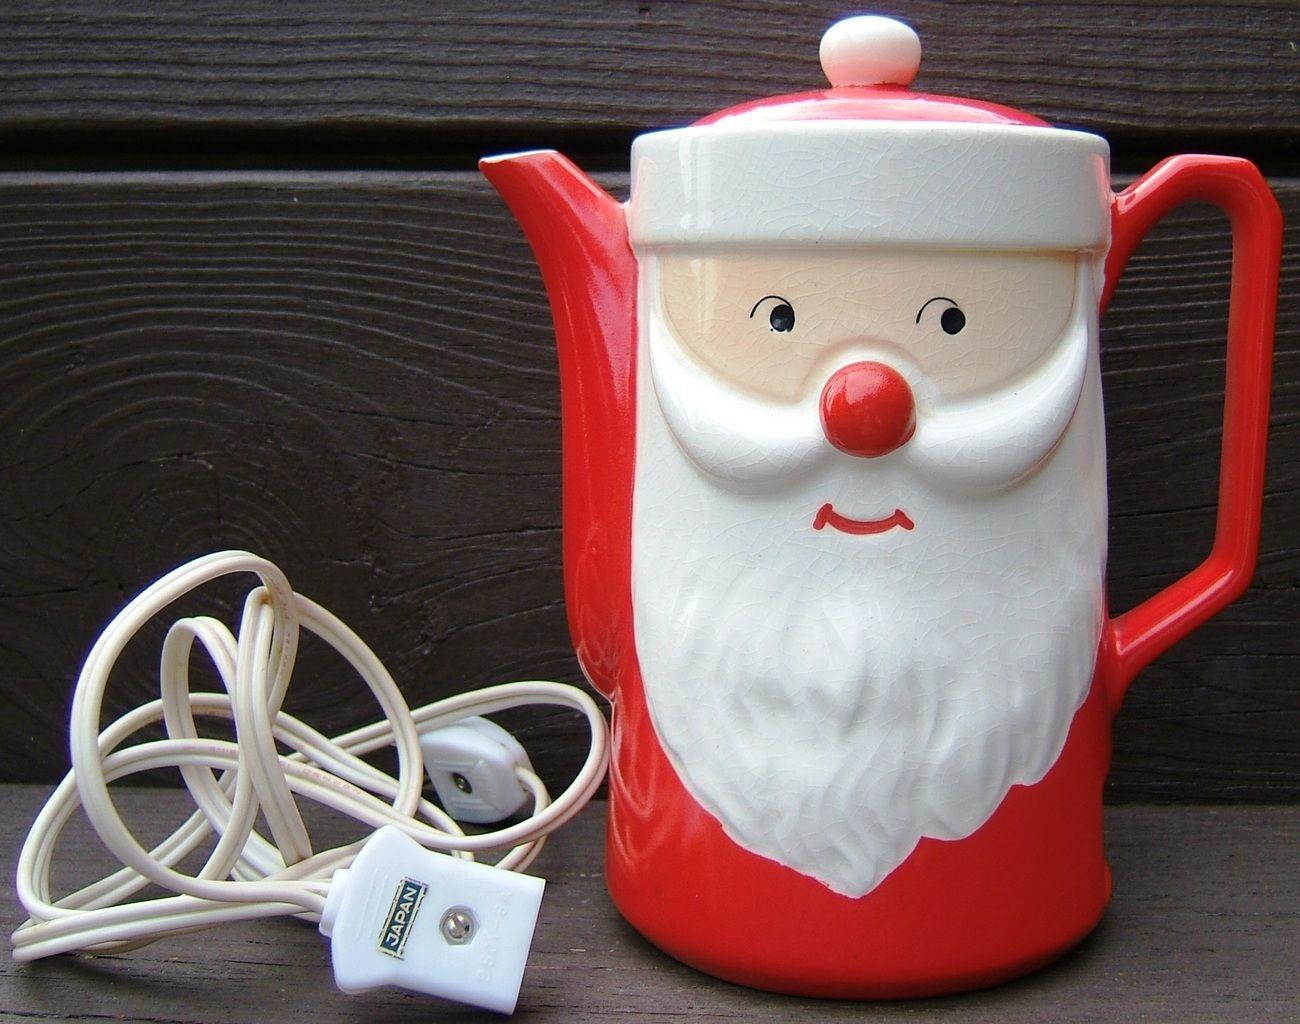 Vintage SANTA CLAUS CHRISTMAS Ceramic Electric HOT WATER POT Dan Brechner JAPAN  http://www.bonanza.com/listings/84874081